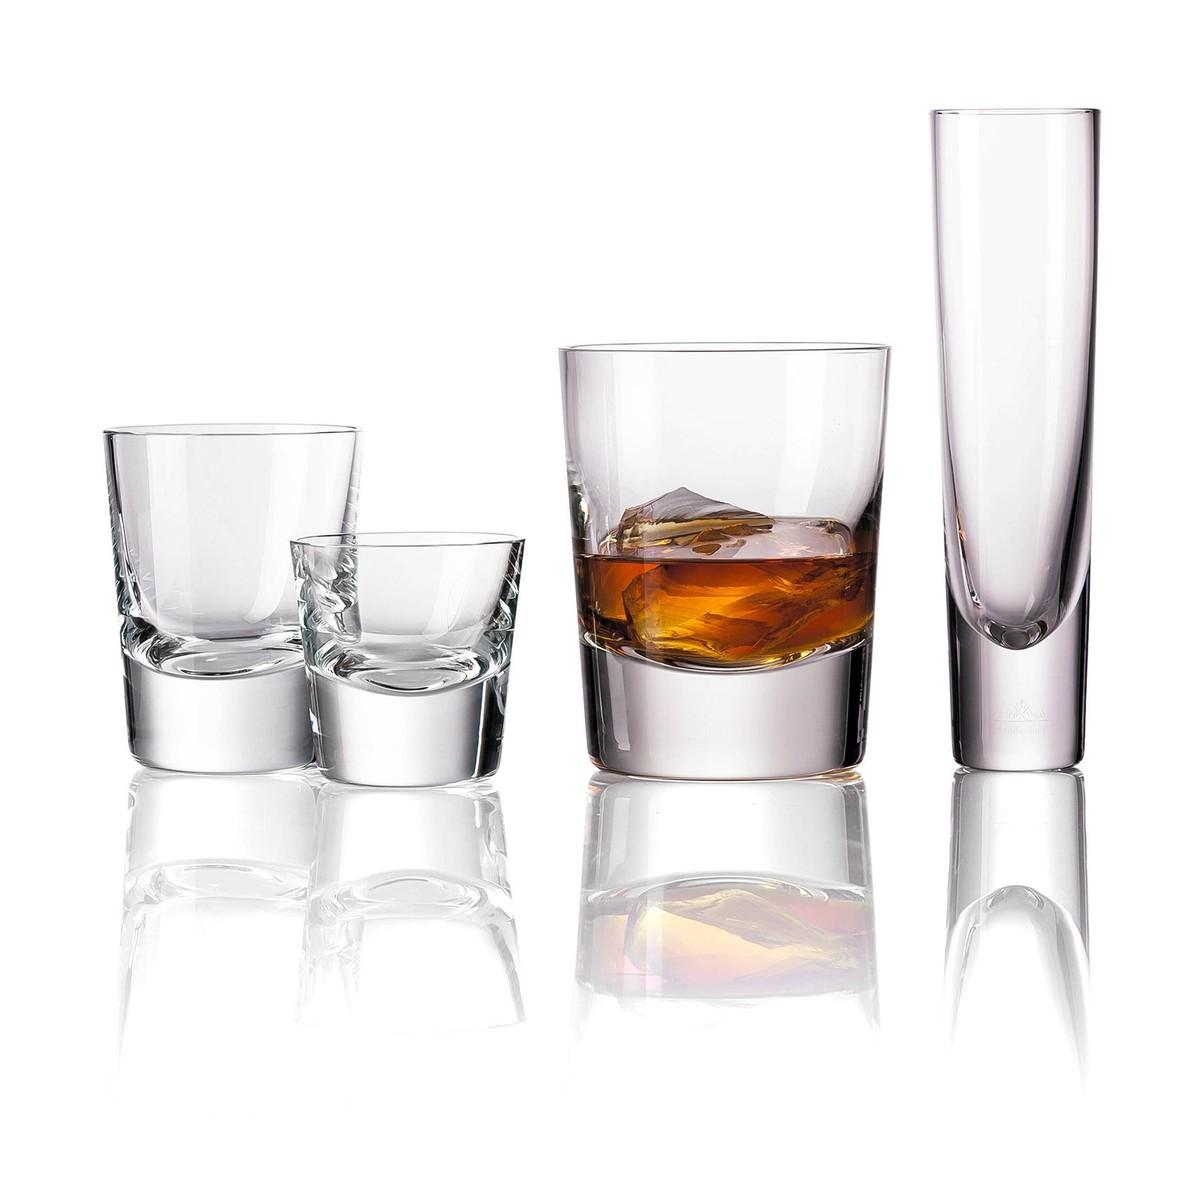 Vero set de 6 verres whisky rosenthal verres for Liquidation set de cuisine